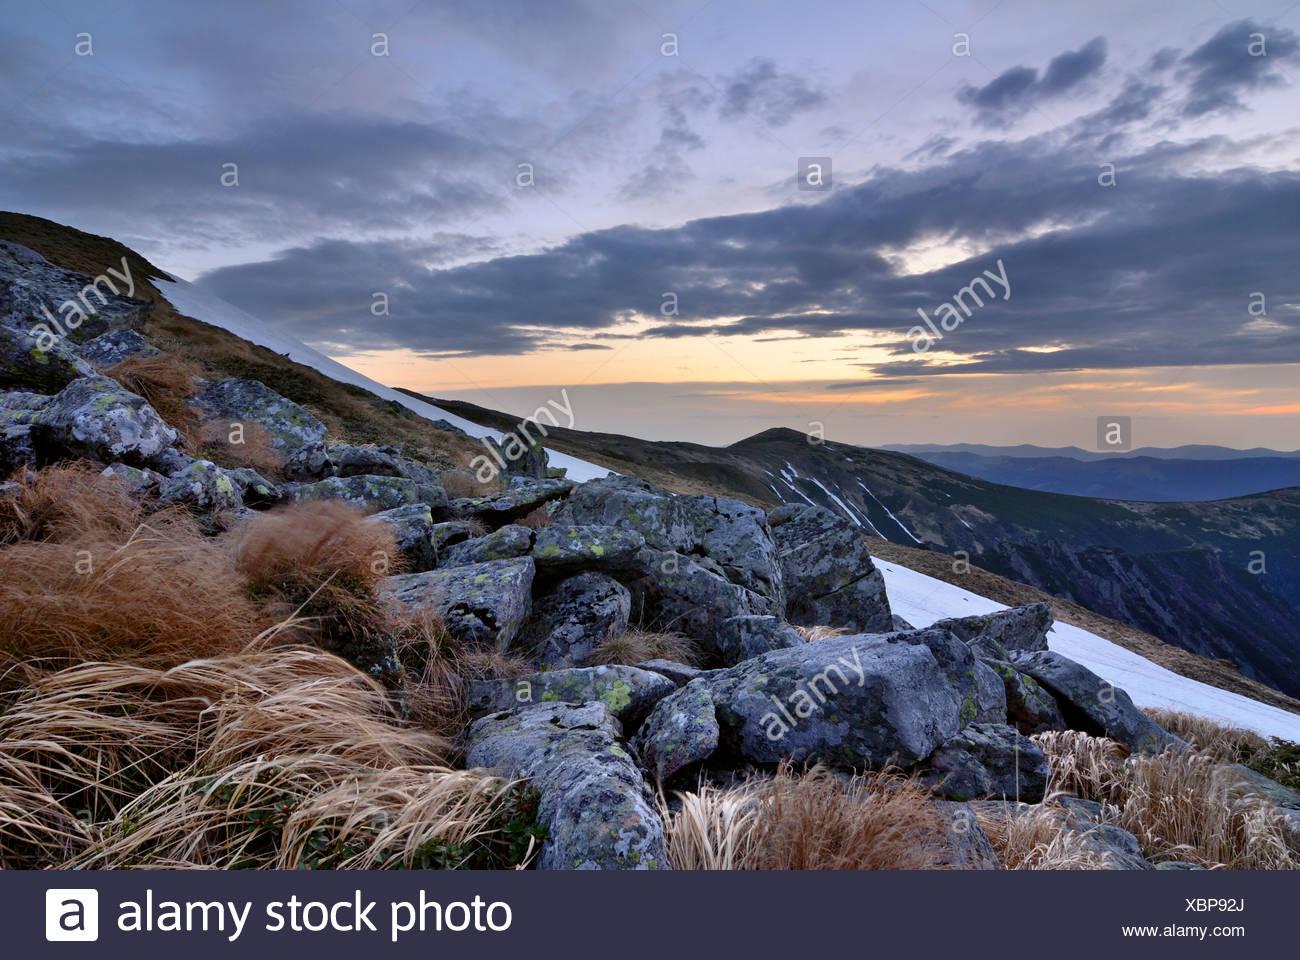 Chornogora Ridge in the Carpathian Mountains - Stock Image